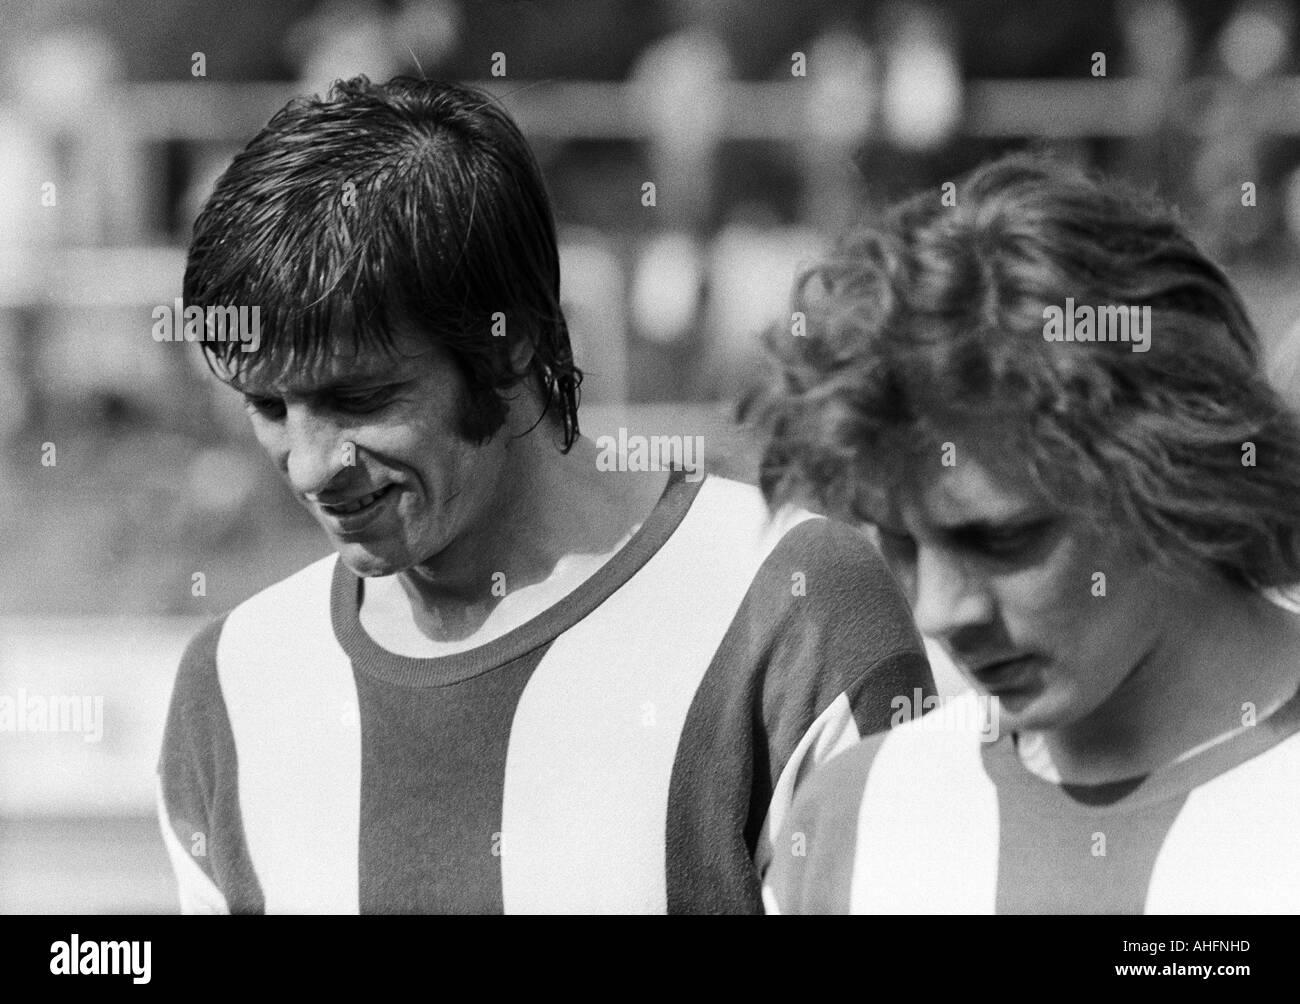 football, Bundesliga, 1971/1972, Rot-Weiss Oberhausen versus Hertha BSC Berlin 5:2, Niederrhein Stadium in Oberhausen, football players leave the pitch for halftime, Lorenz Horr (Berlin) left and Arno Steffenhagen (Berlin) - Stock Image